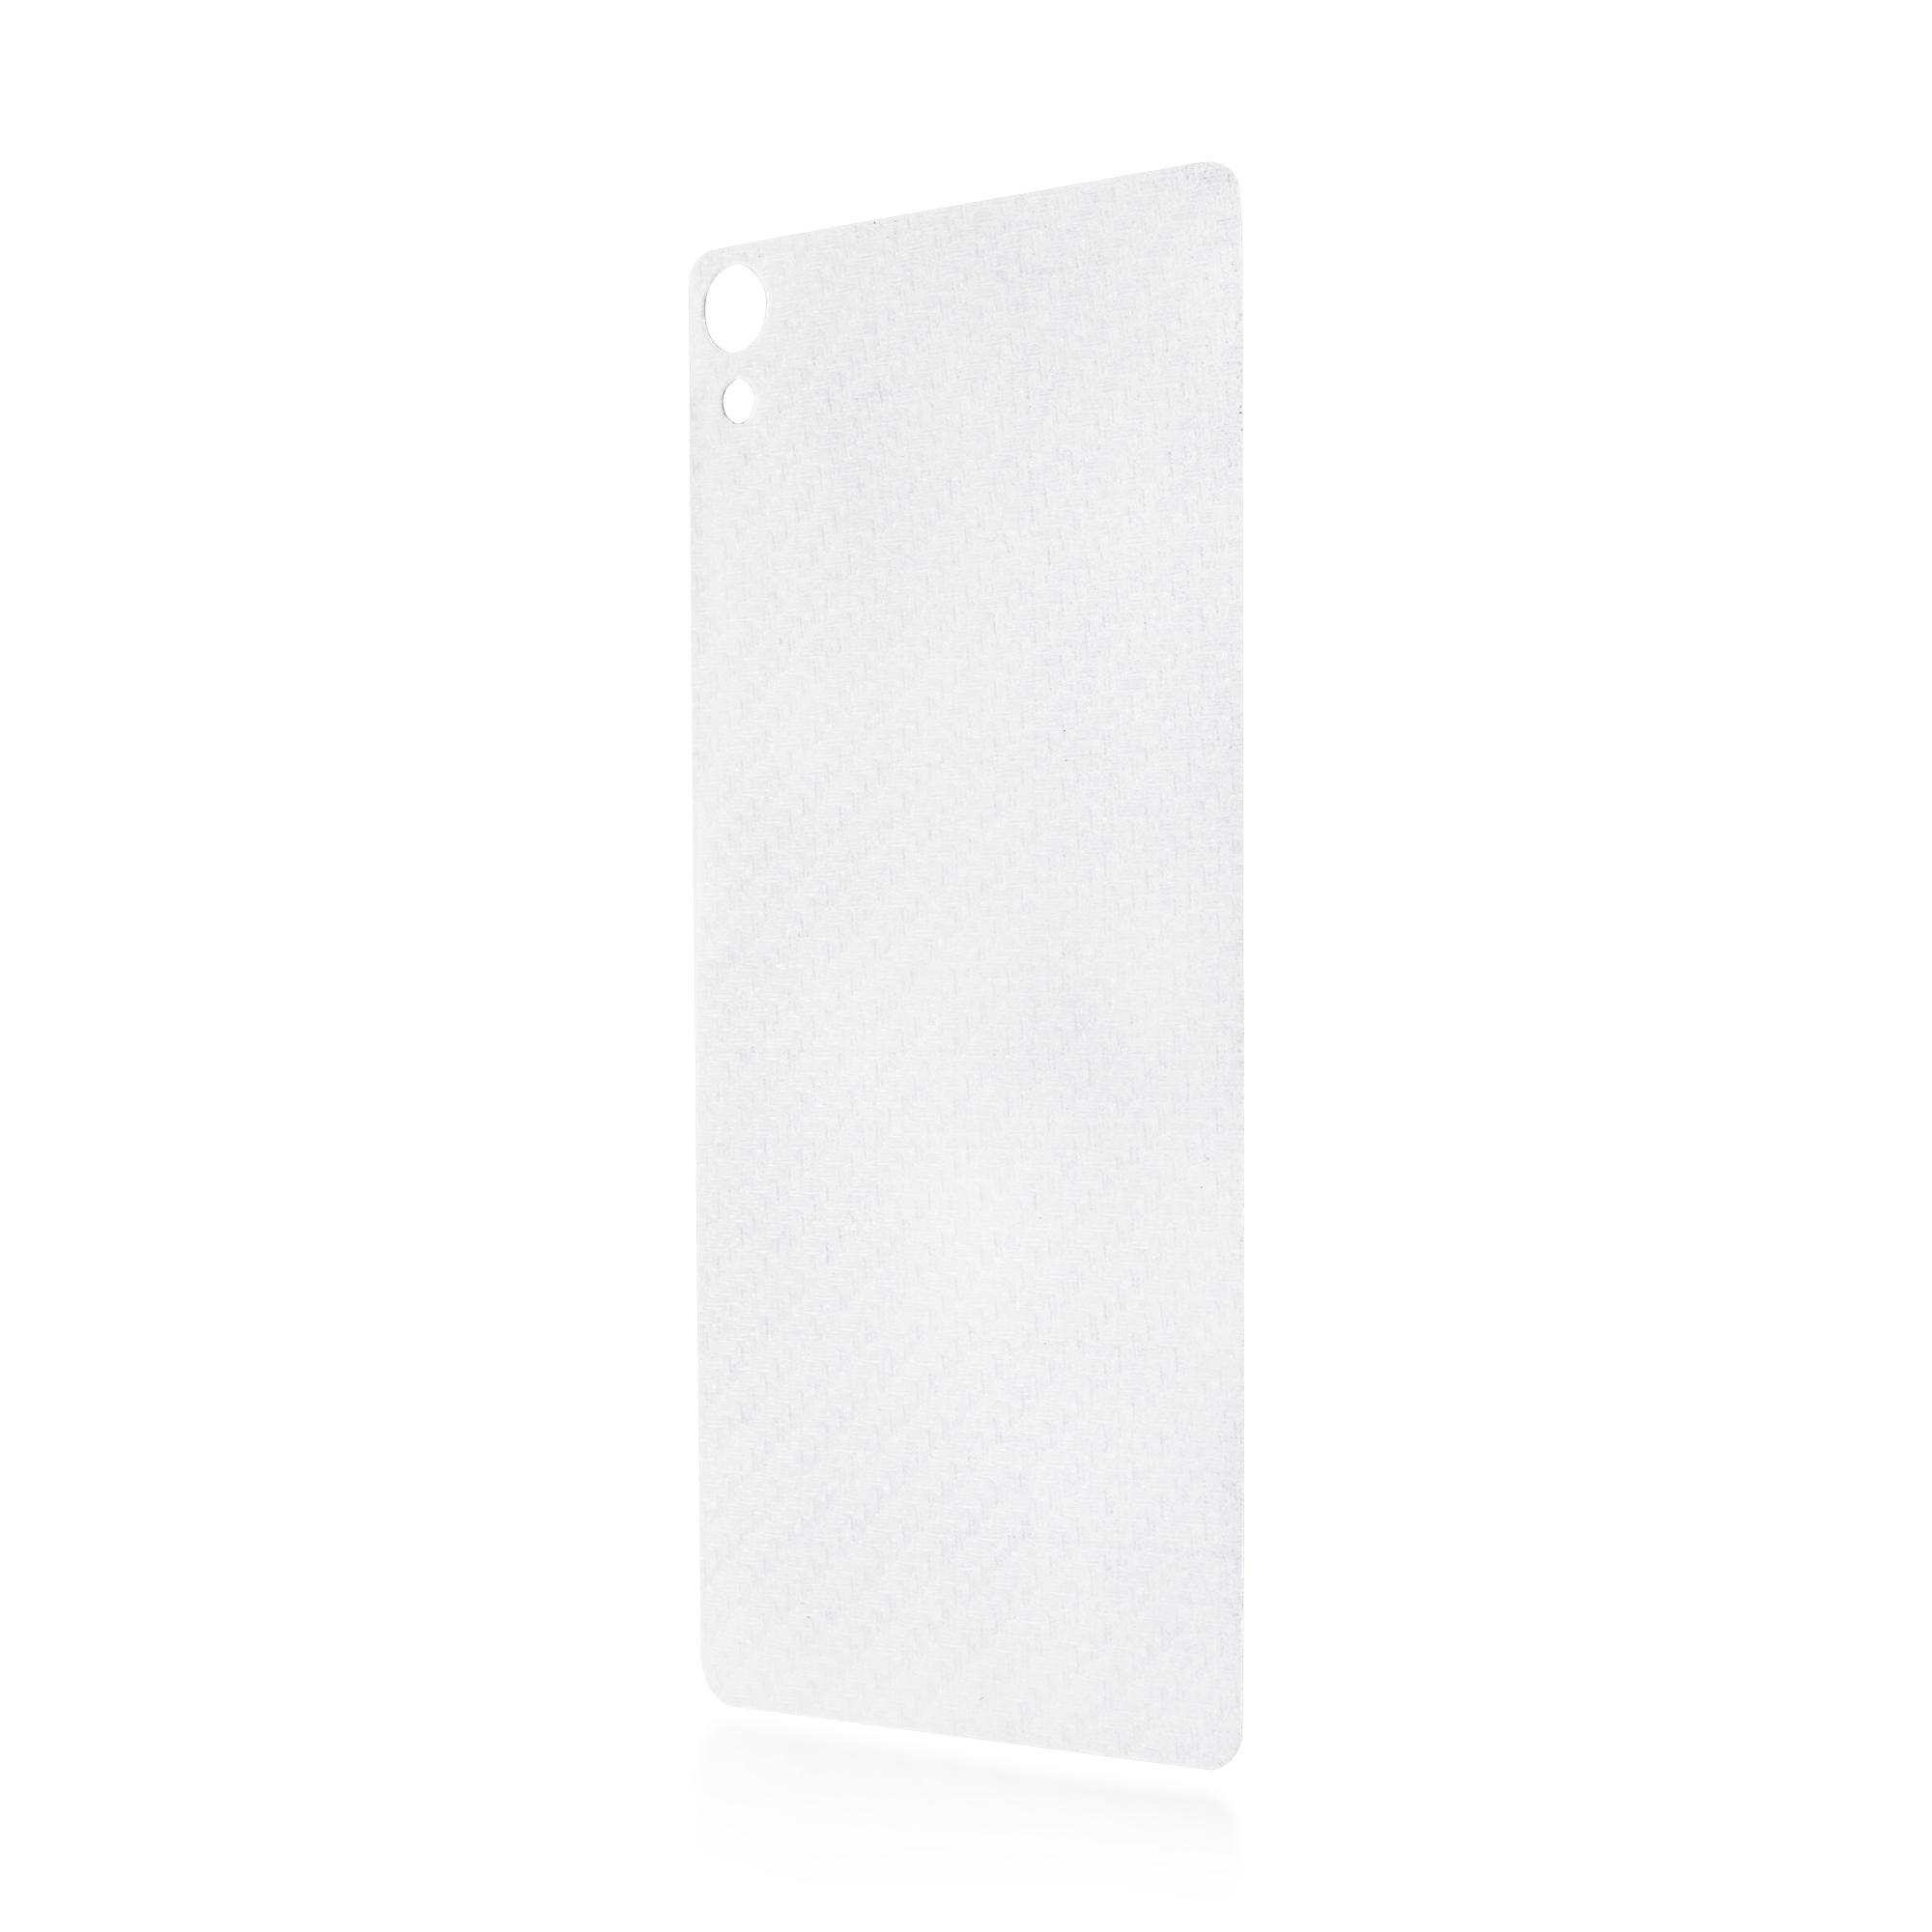 Задняя защитная плёнка для Xperia XA, карбон